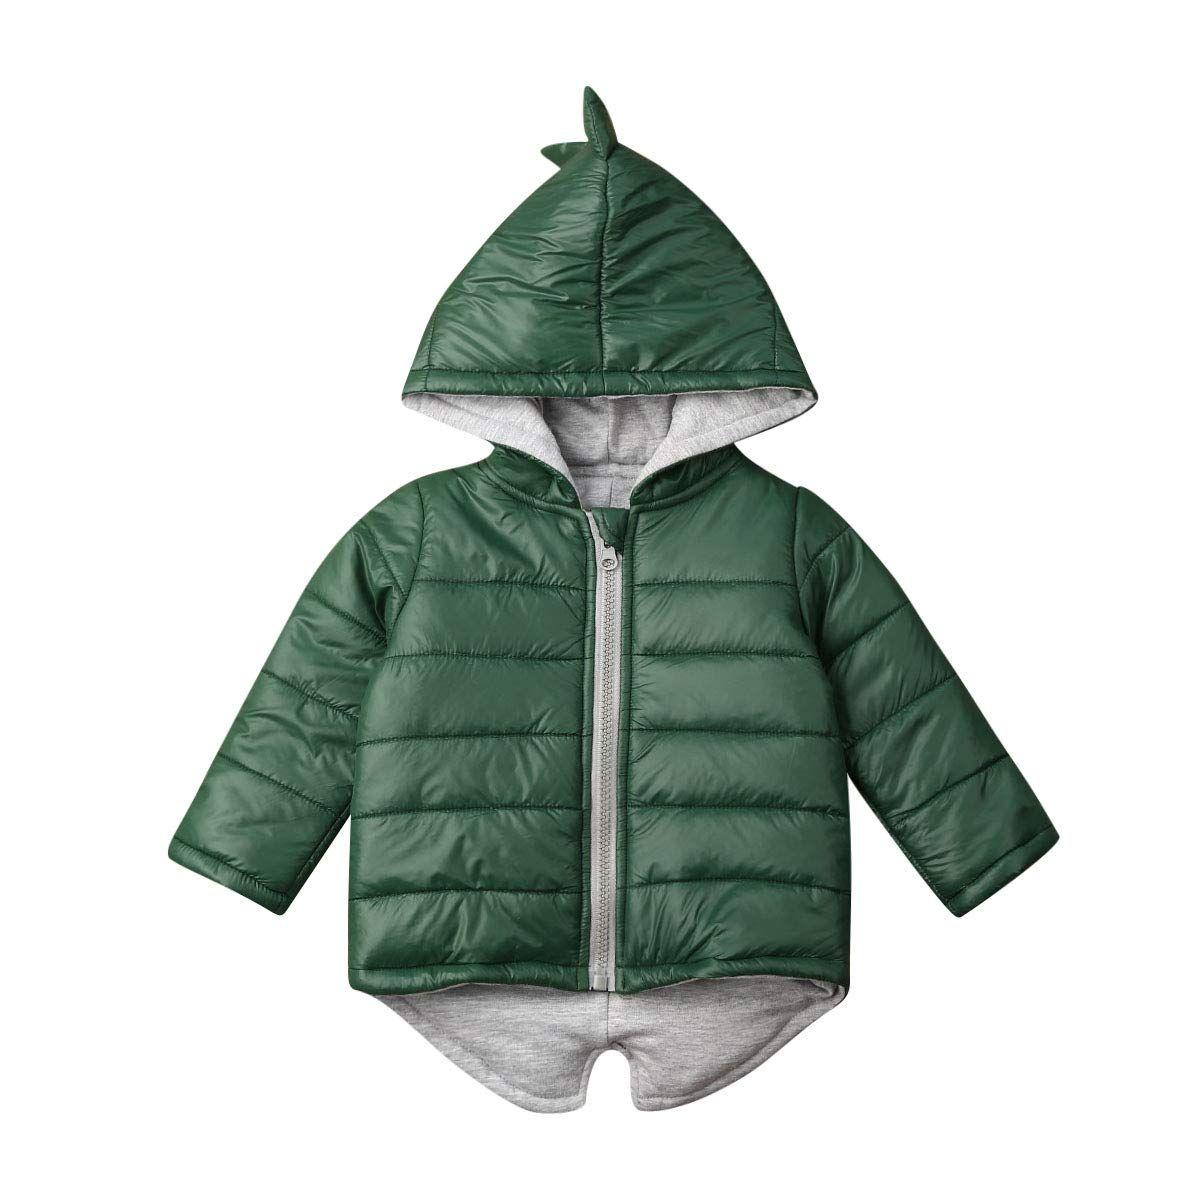 Toddler Baby Boy Girl Coat 3d Dinosaur Winter Long Sleeve Hooded Outerwear Jacket With Zipper 3 4 Years Green Boy Outerwear Warm Jacket Hooded Outerwear [ 1200 x 1200 Pixel ]